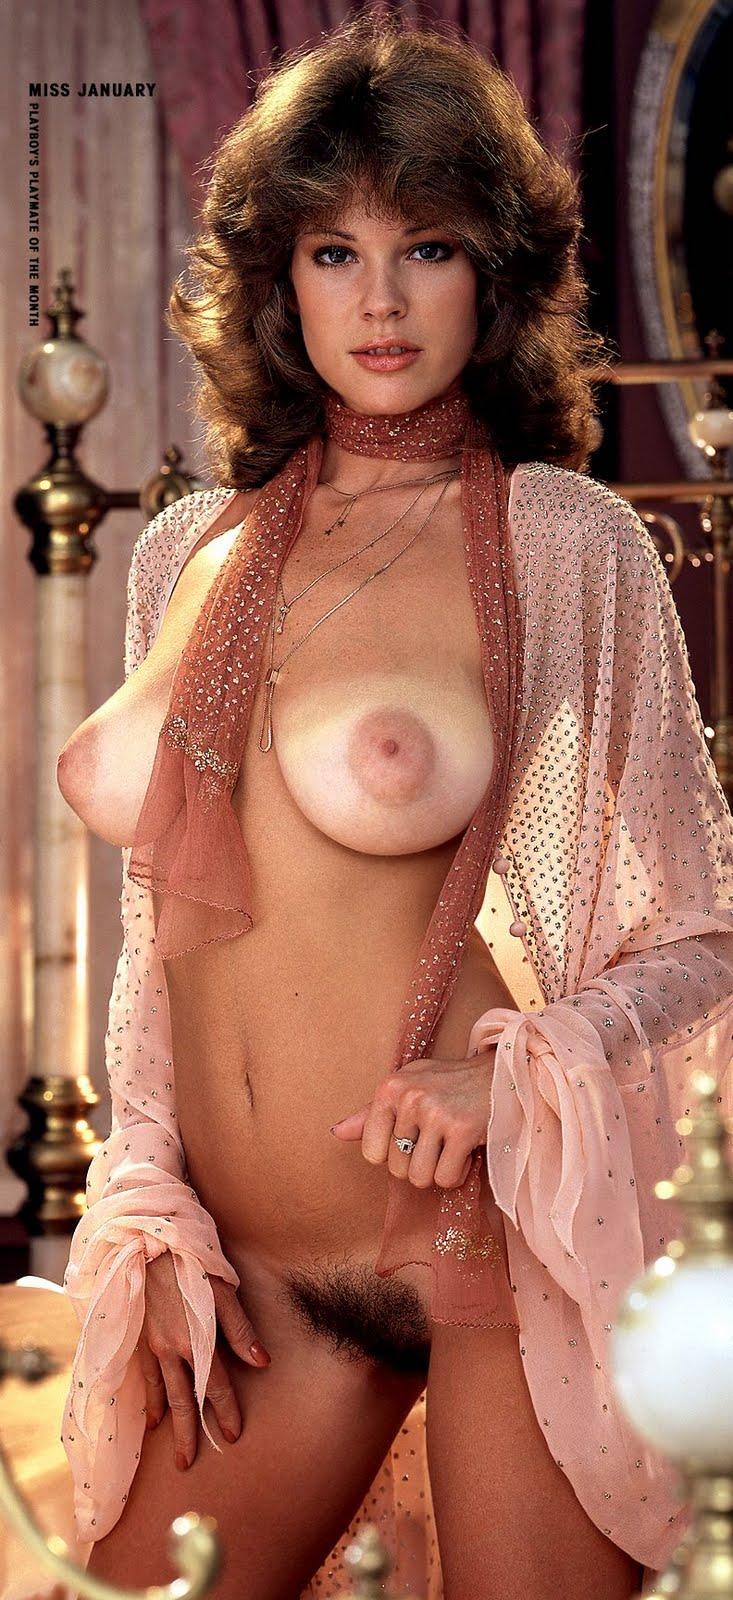 Playboy Pamela Horton Nude